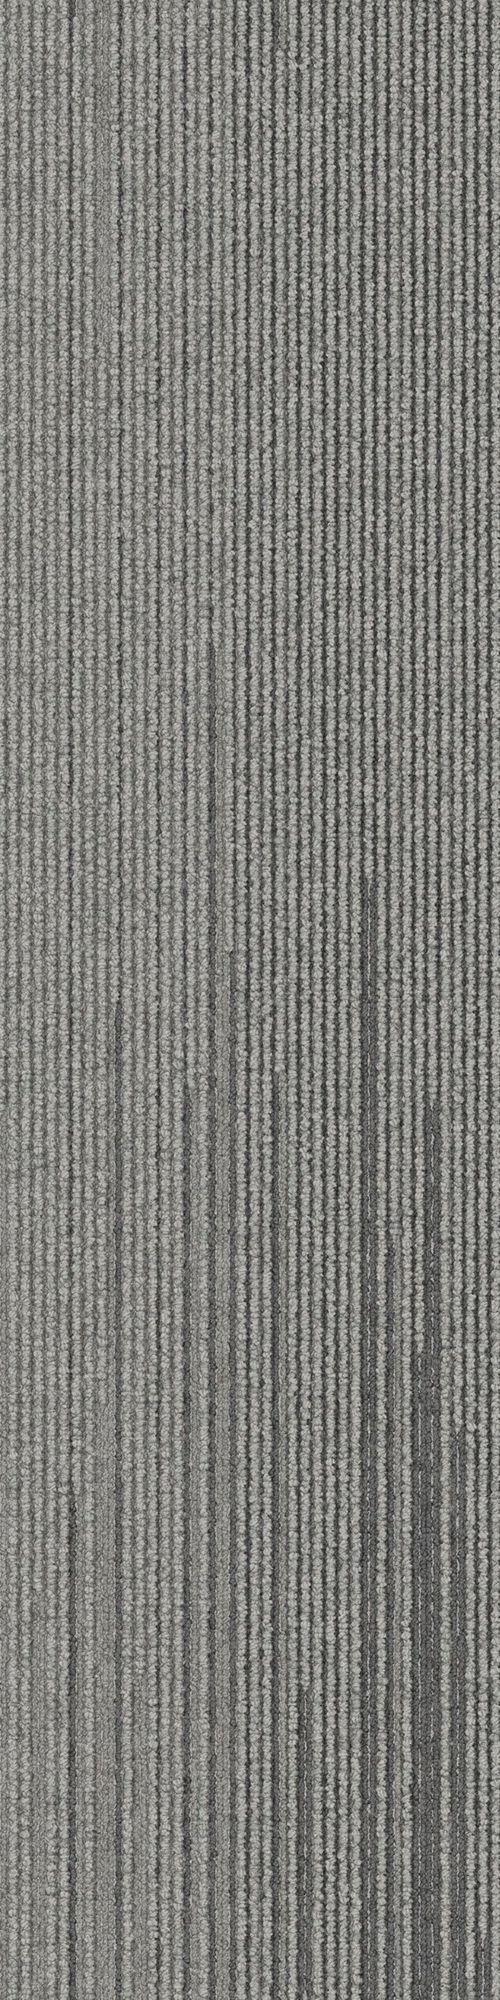 Interface carpet tile: SL930 Color name: Grey Fade Variant 2